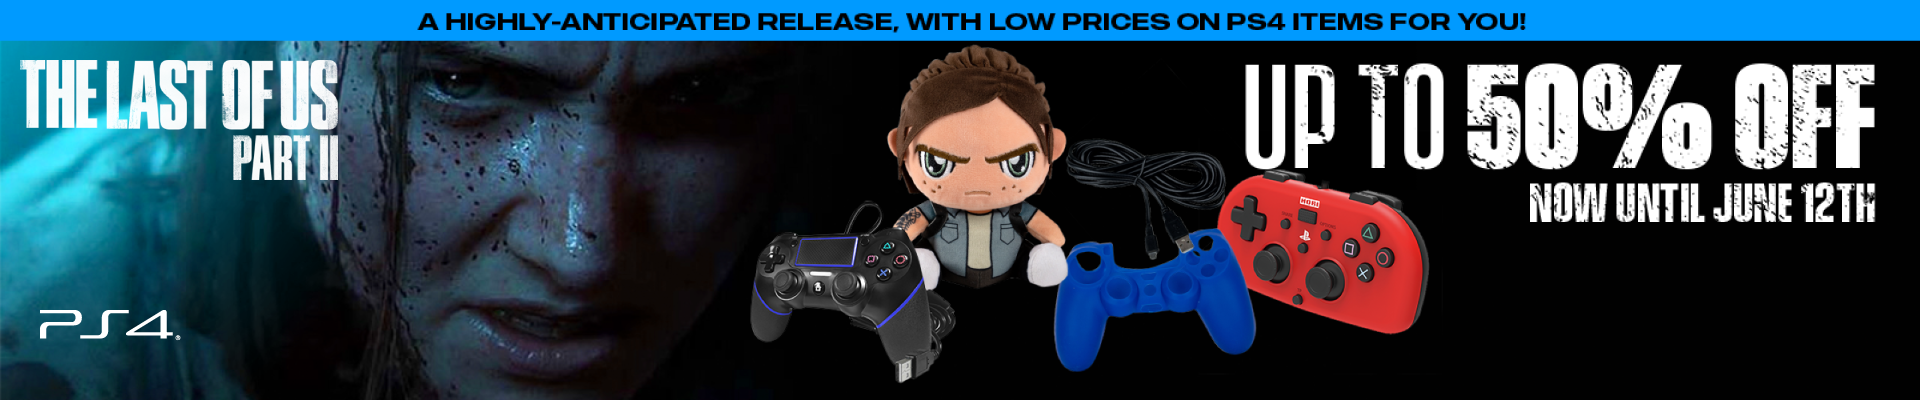 The Last of Us Part II - Sale